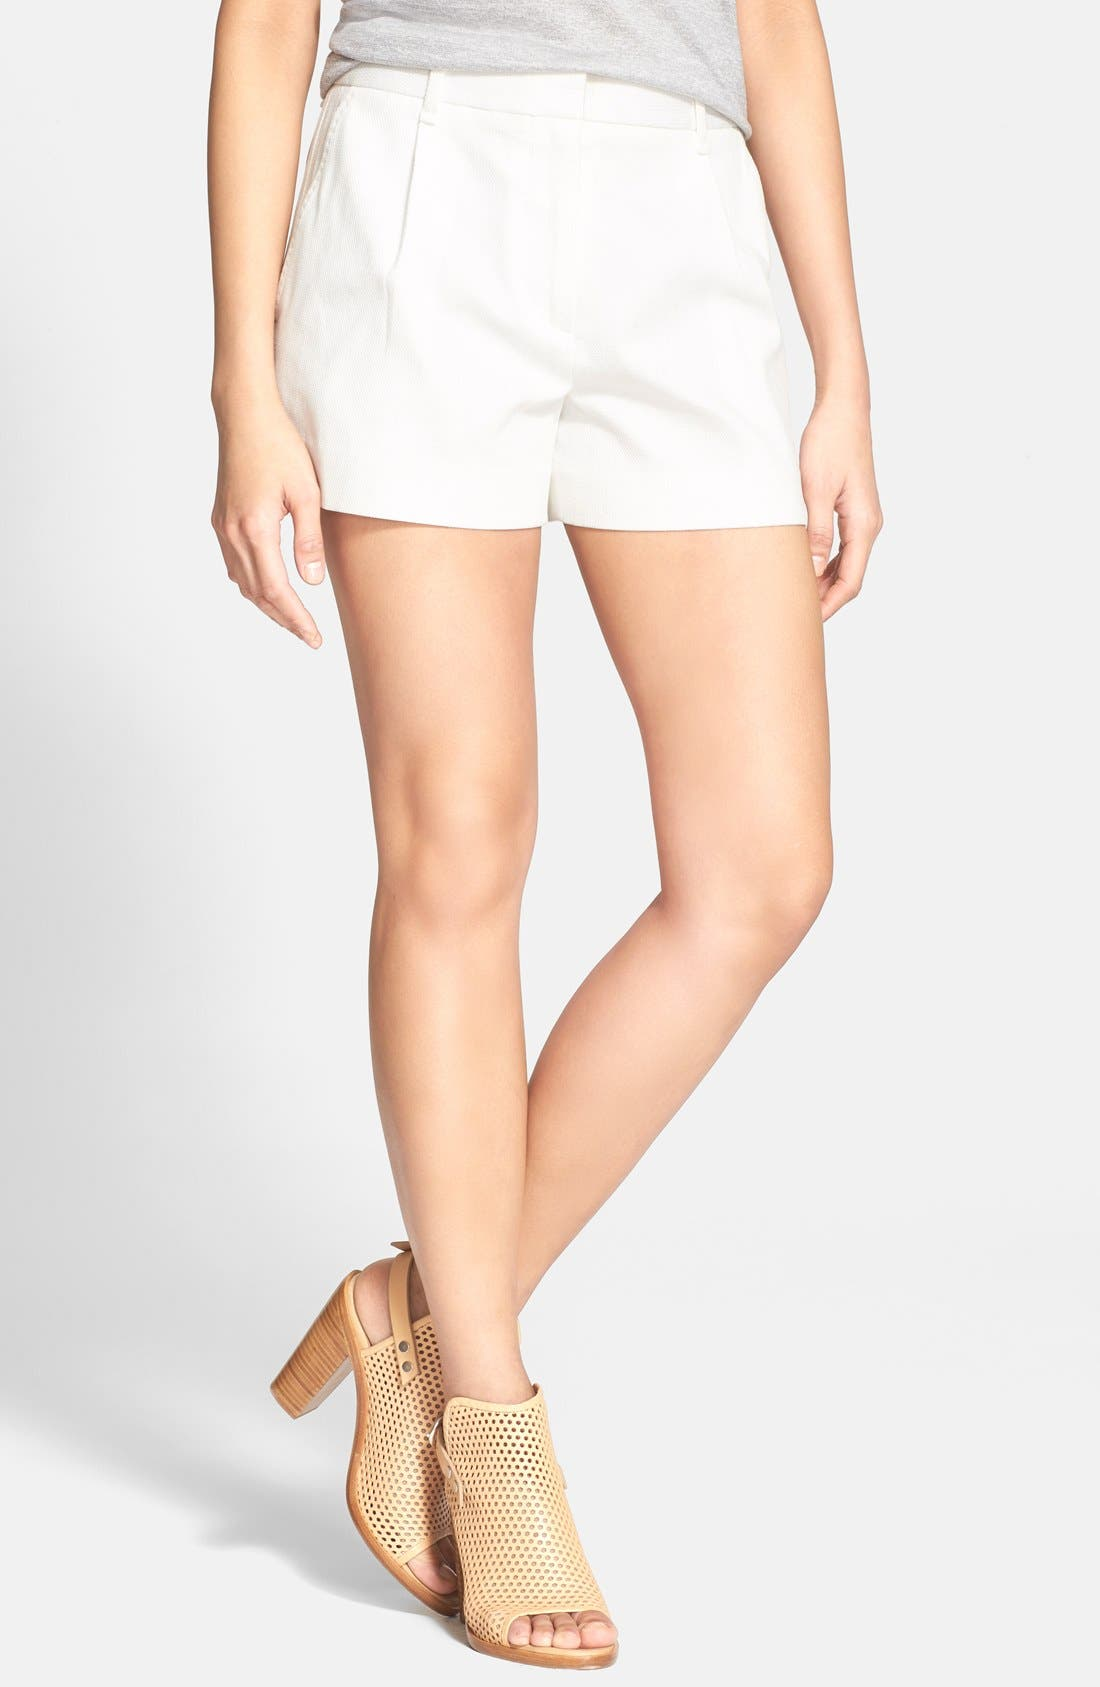 RAG & BONE, 'Montgomery' Stretch Cotton Shorts, Main thumbnail 1, color, 105